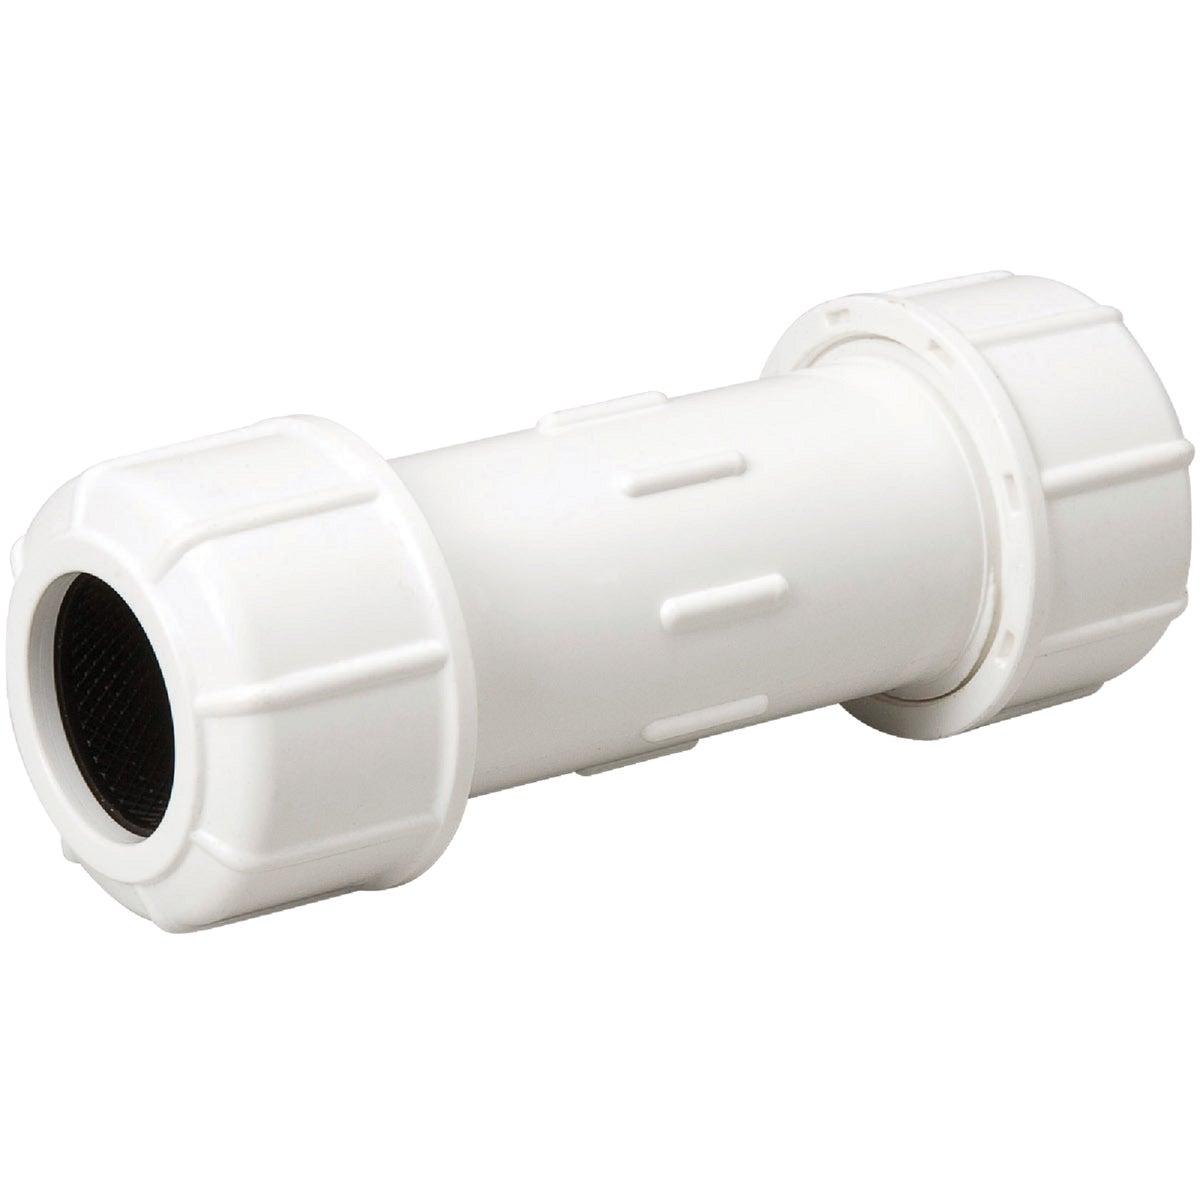 2X7-1/2 PVC COUPLING - 160-108 by Mueller B K